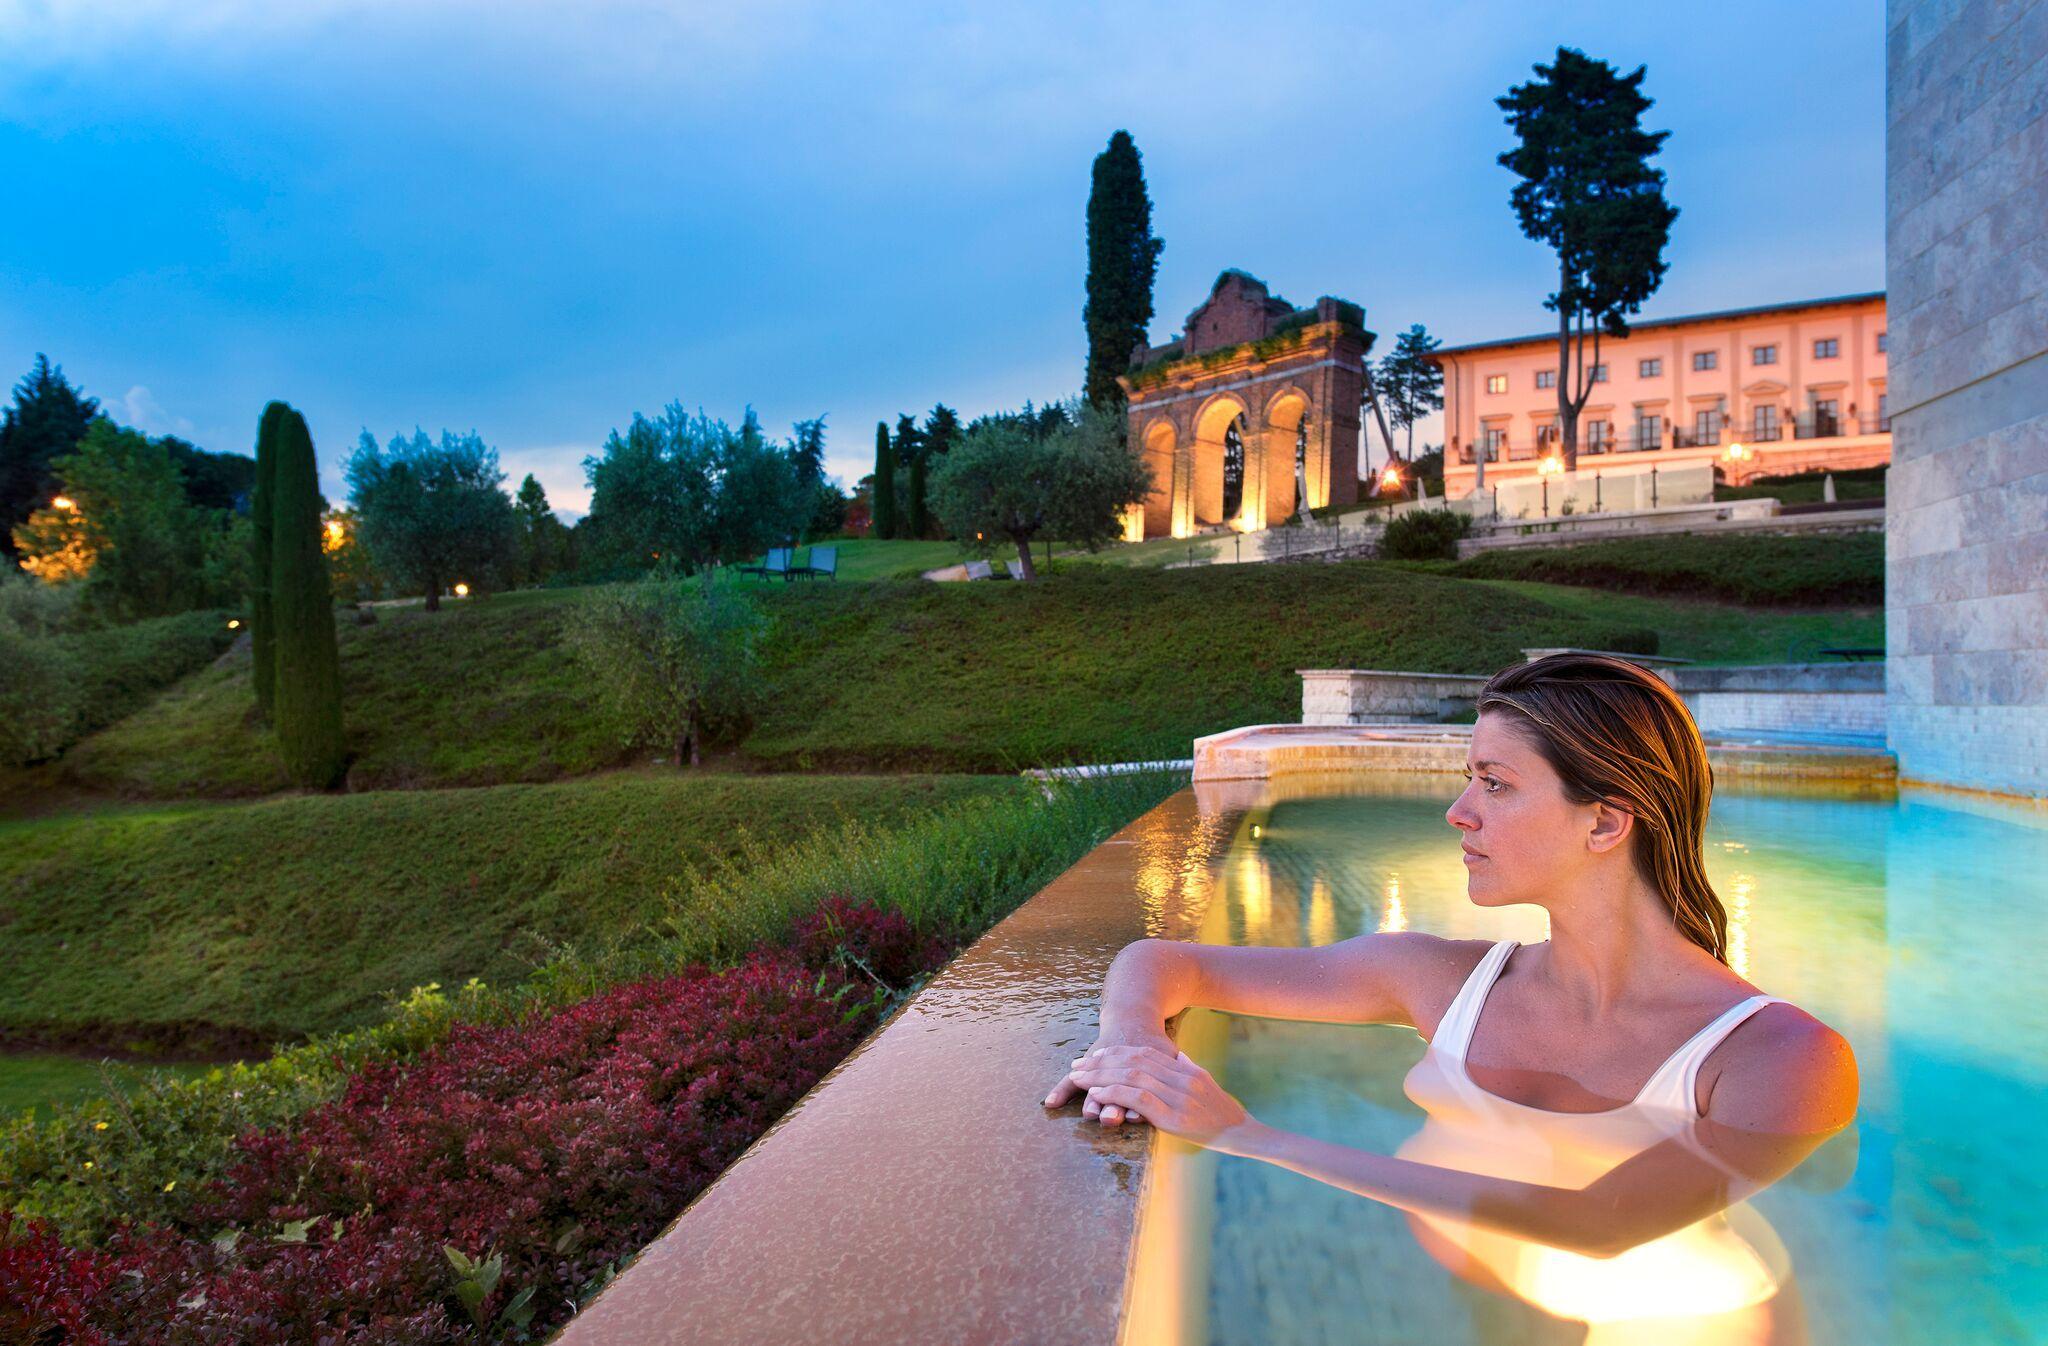 Fonteverde Terme Amp Hotel San Casciano Dei Bagni Siena